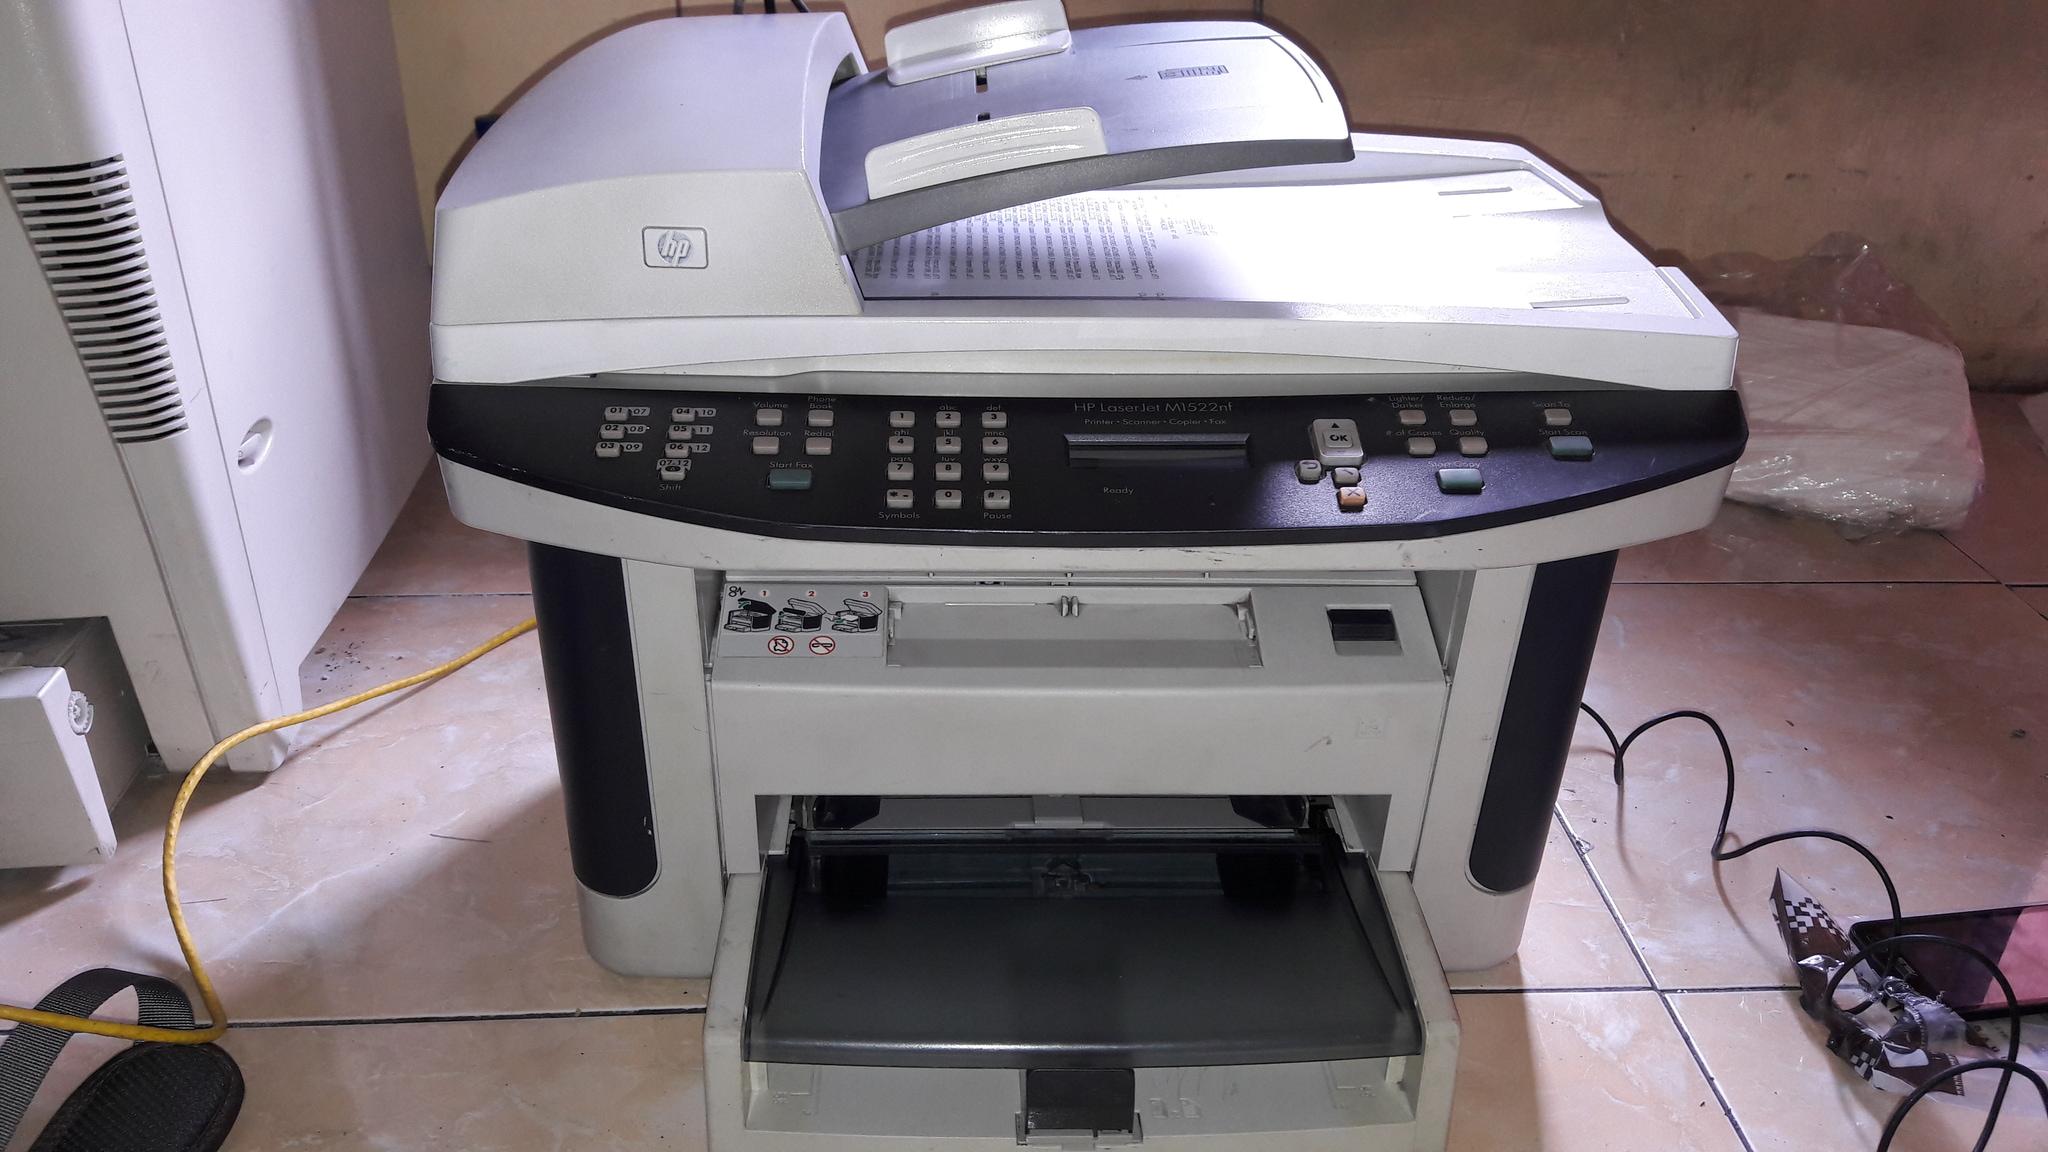 HP LASERJET M1522 MFP UPD PCL 6 DRIVERS PC